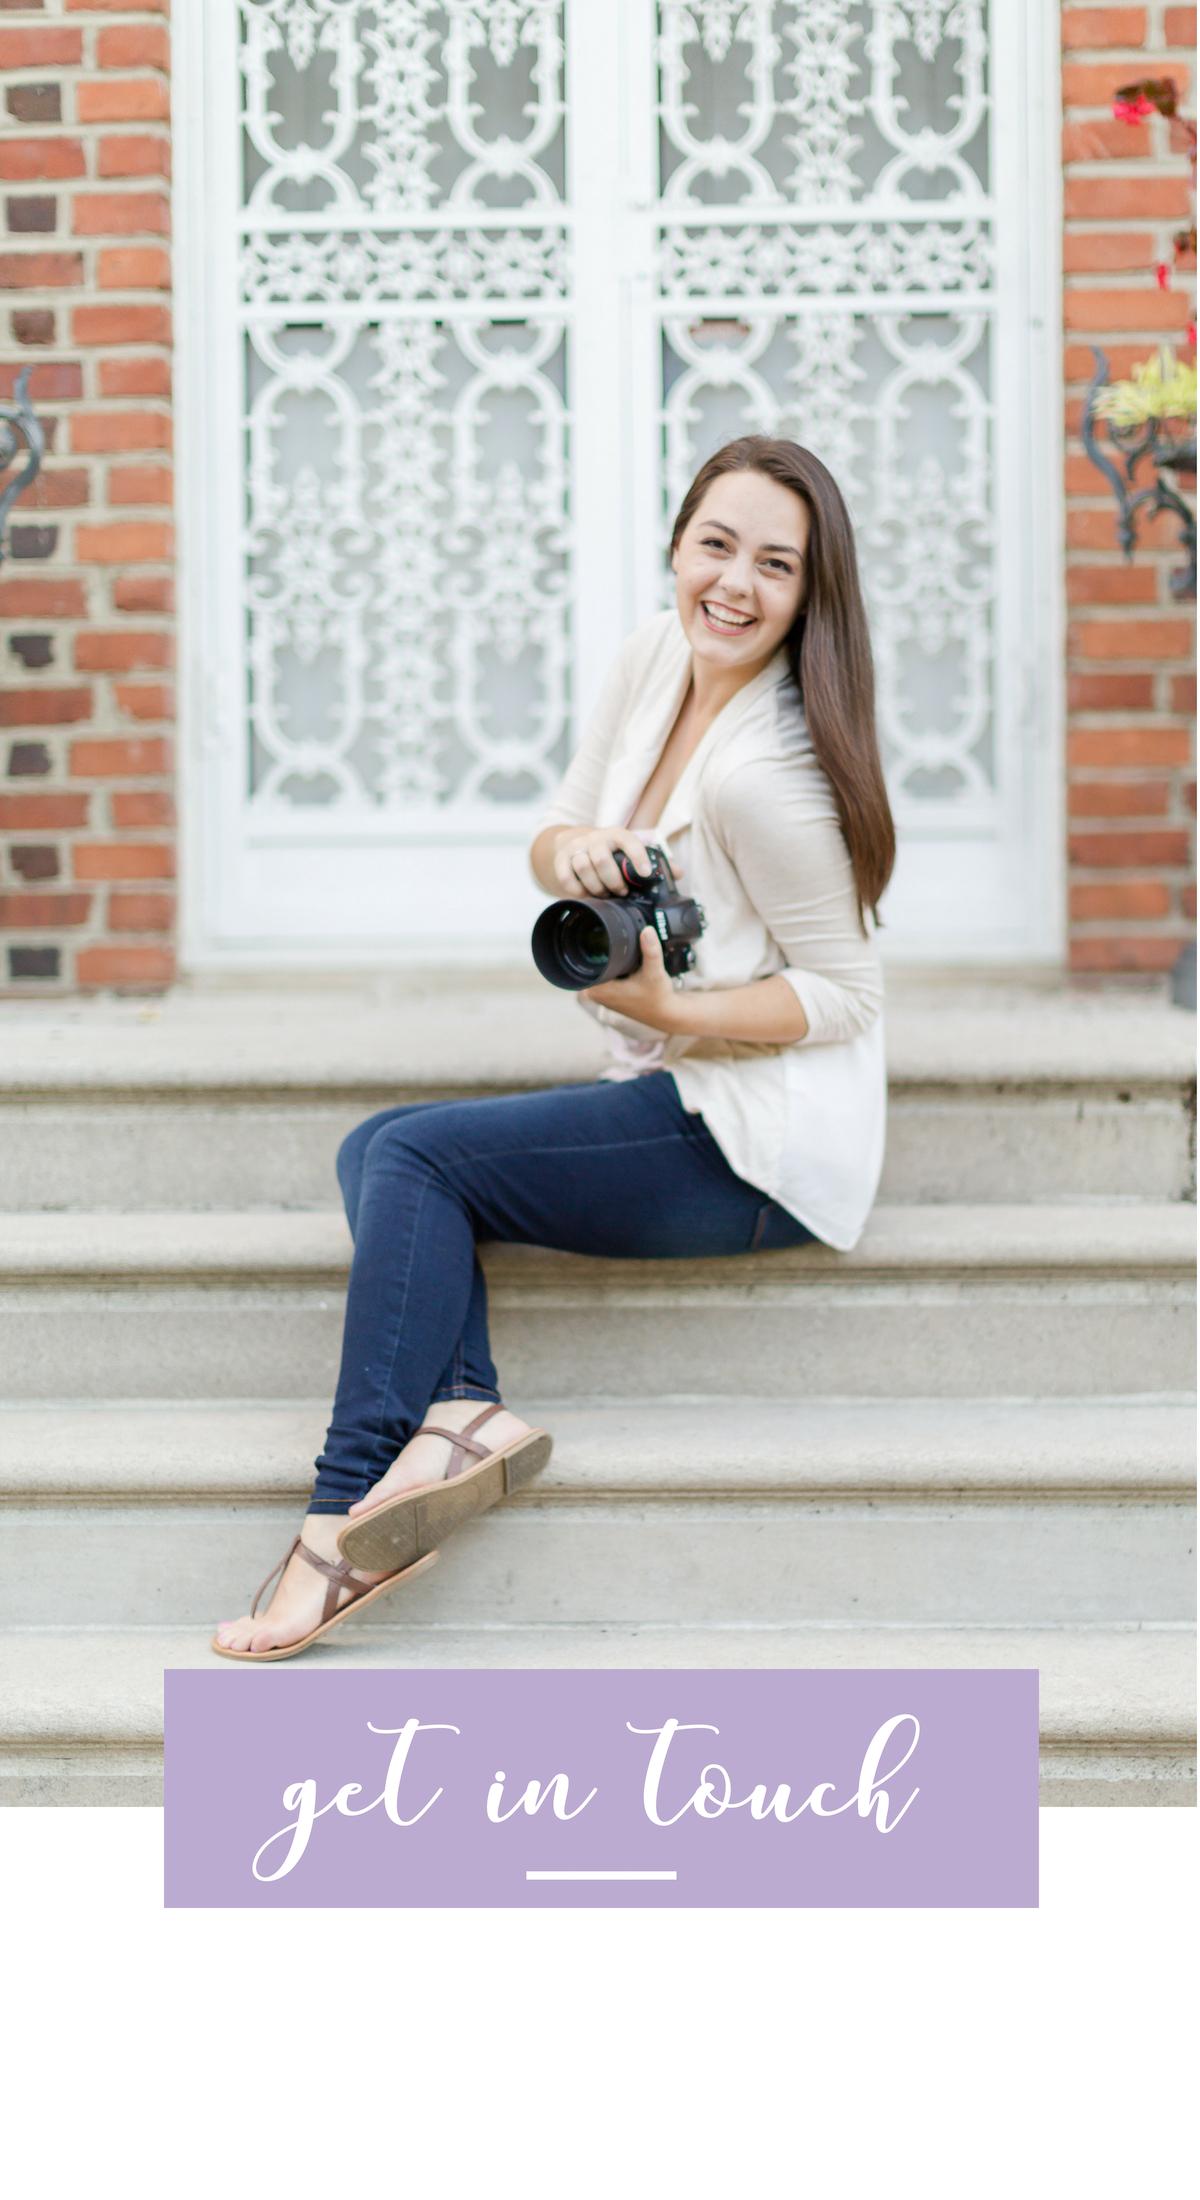 Rakoteet Photography Homepage (8)3.jpg